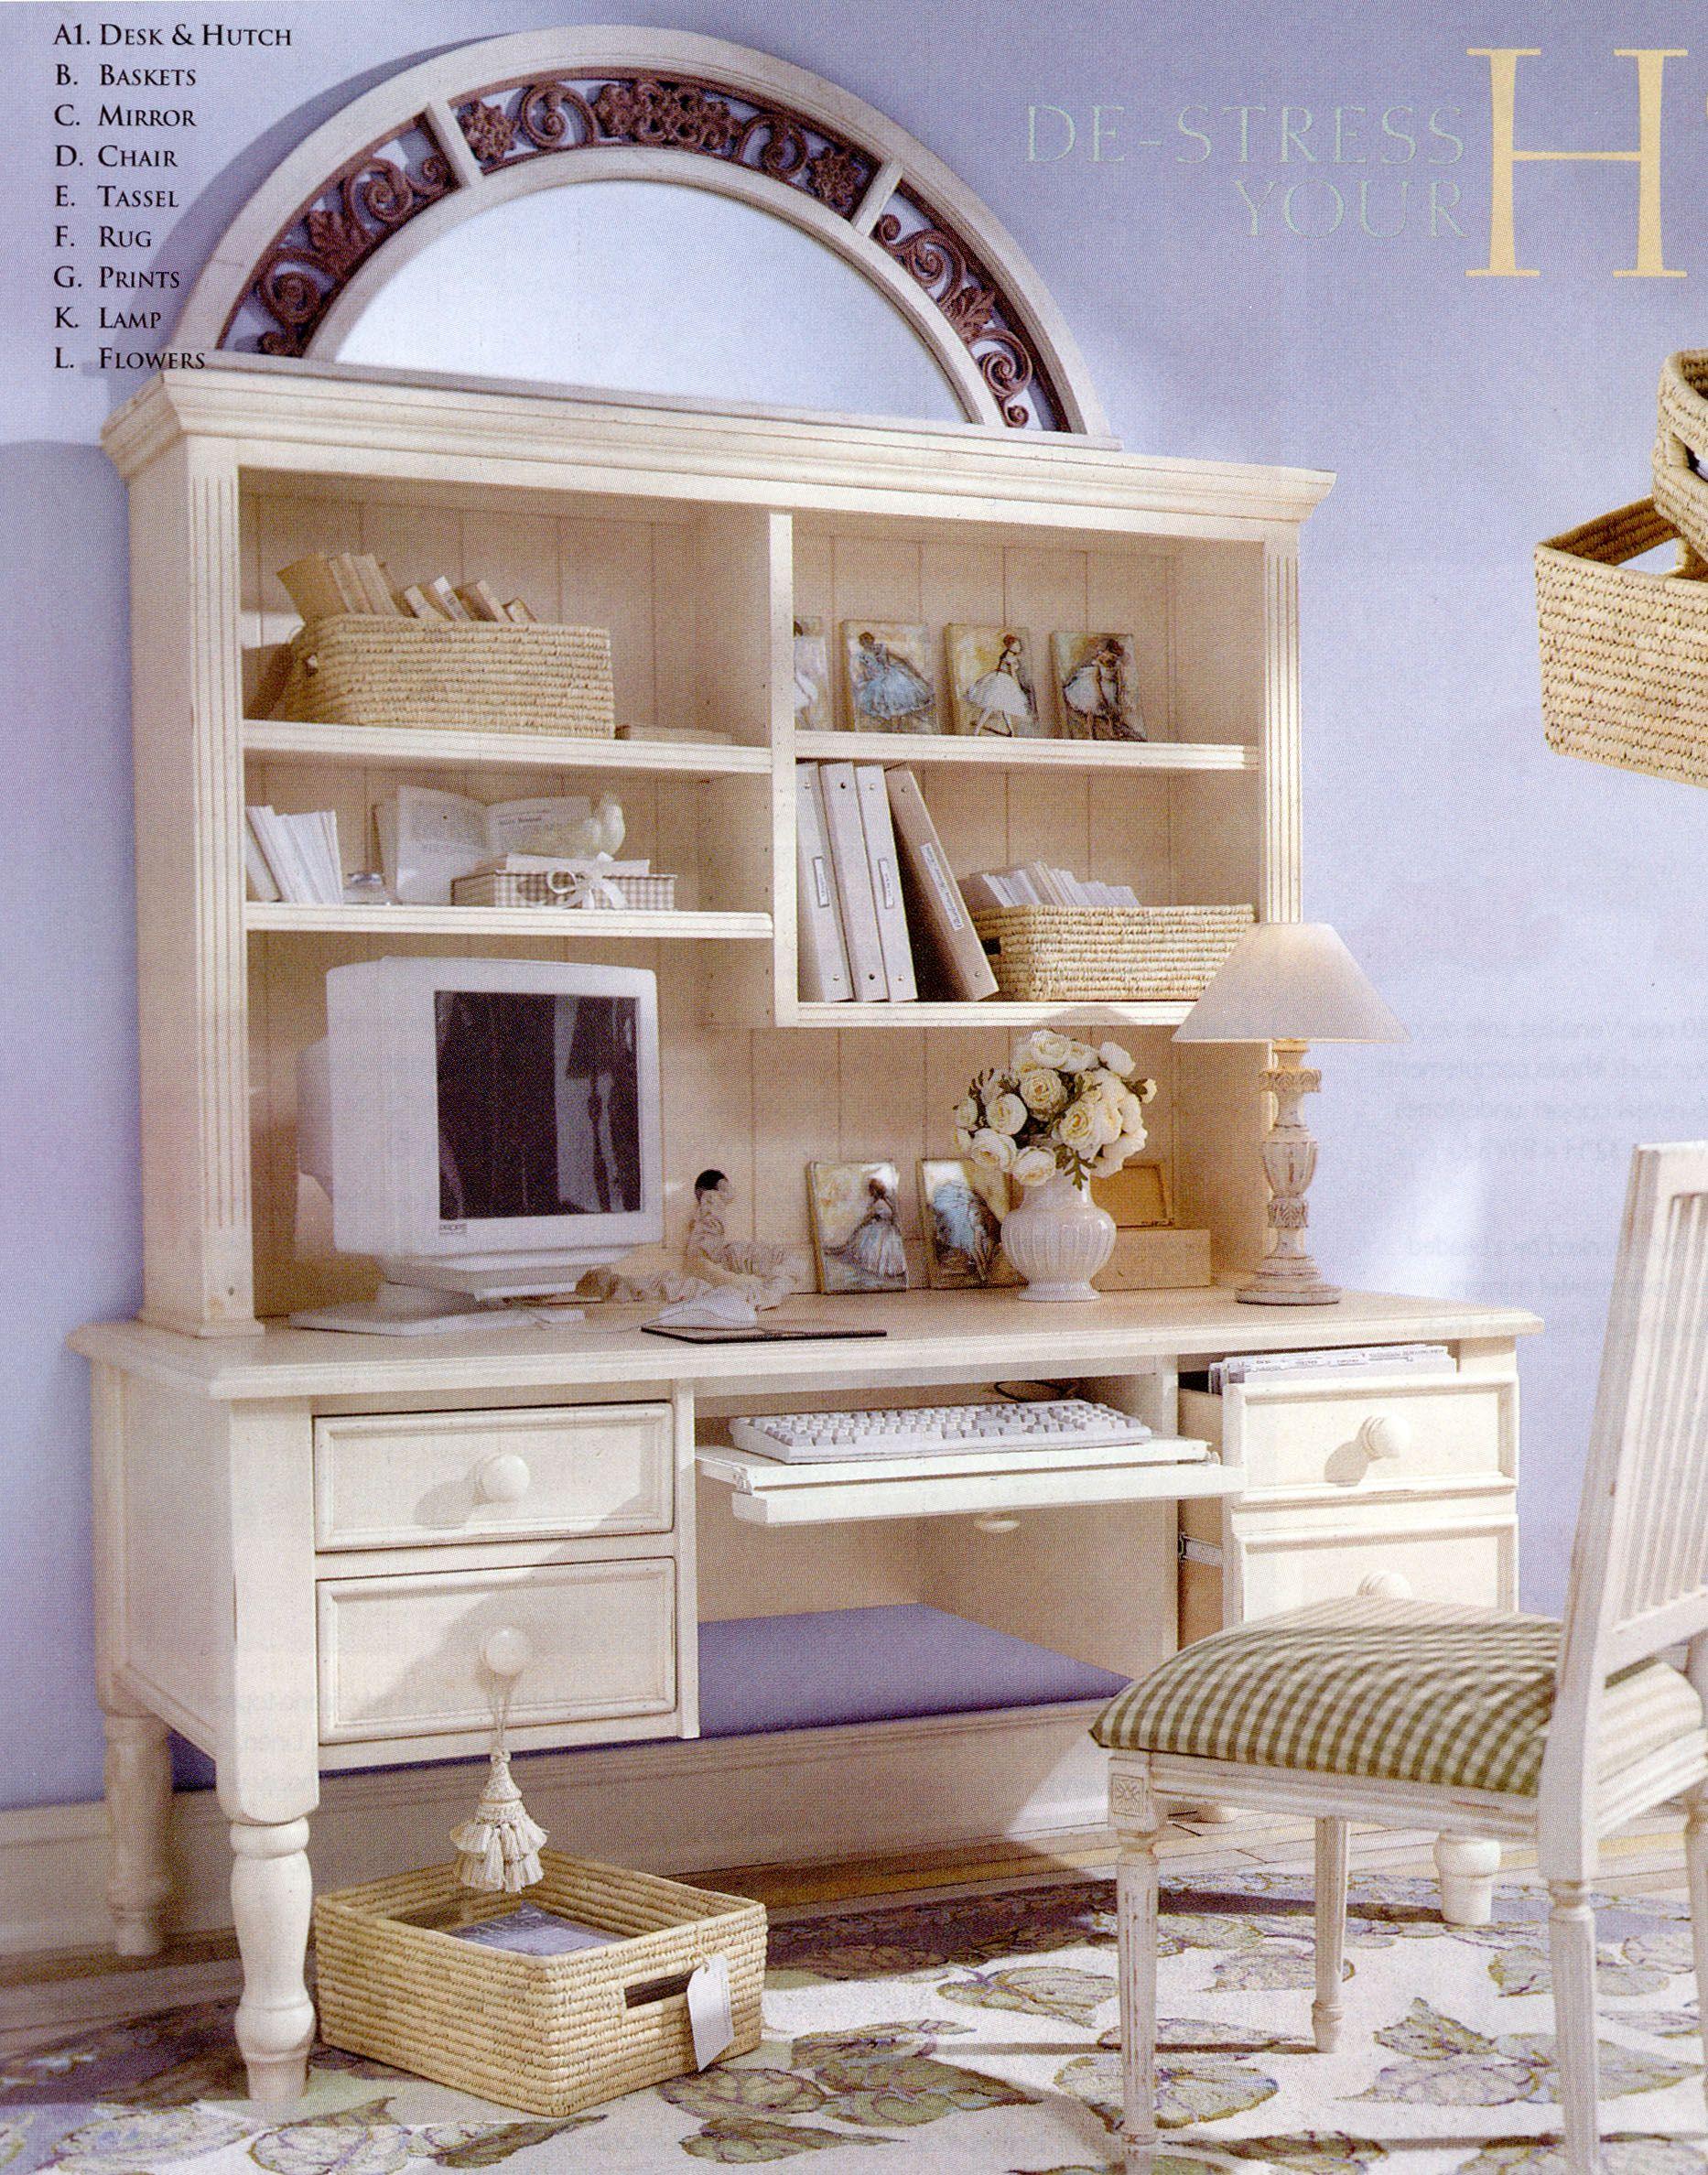 Ballard Designs Home Office Desk & Hutch  For the Home  Pinterest